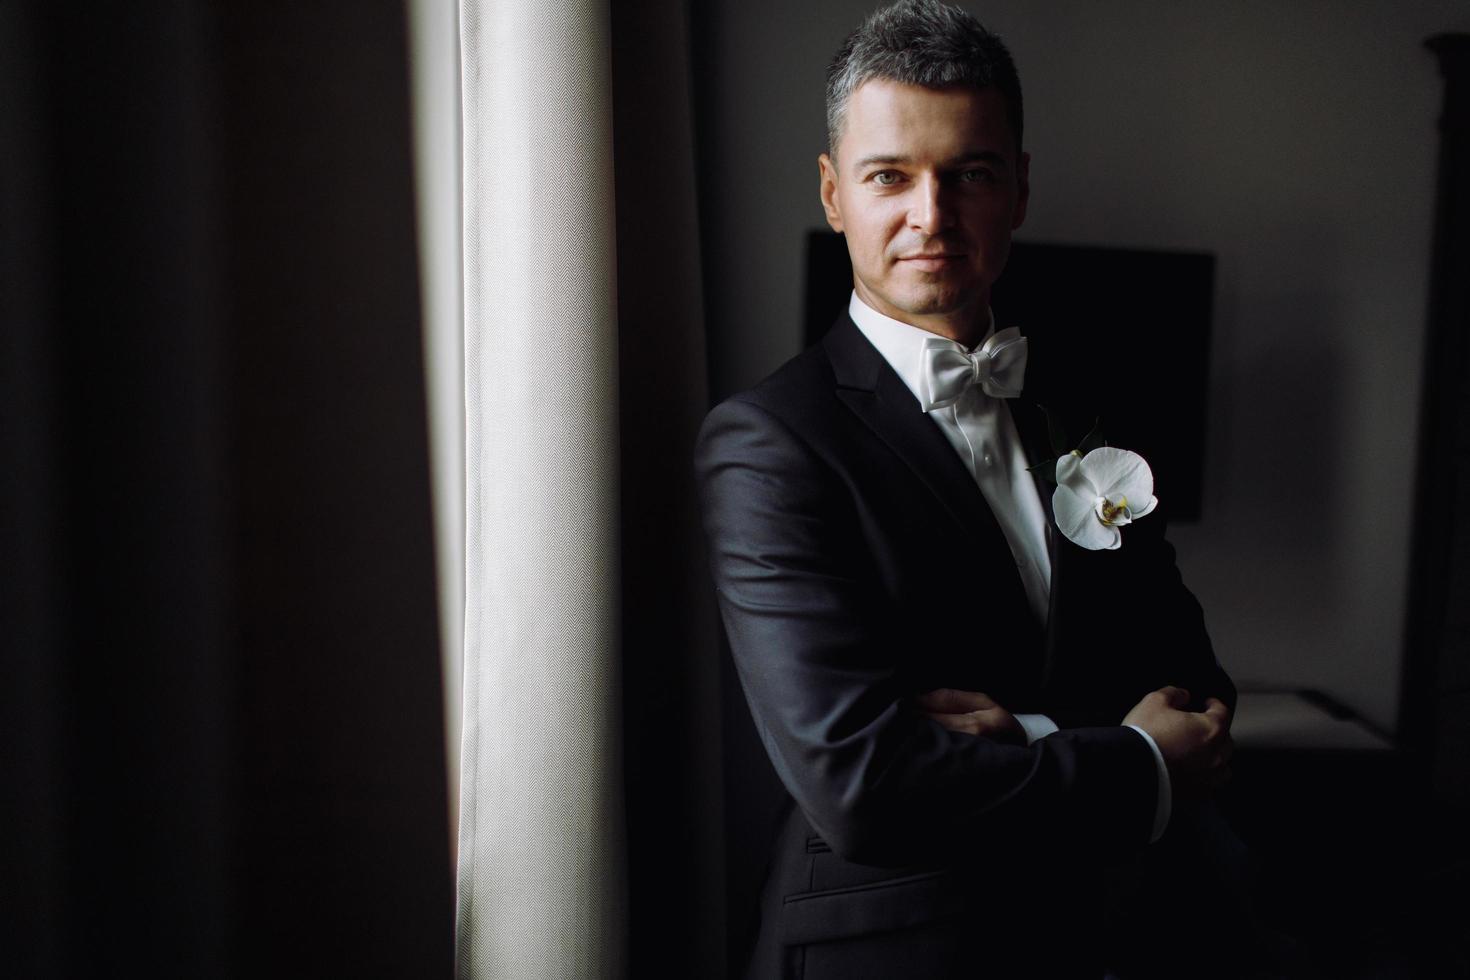 Handsome groom in black tuxedo stands in a dark hotel room photo